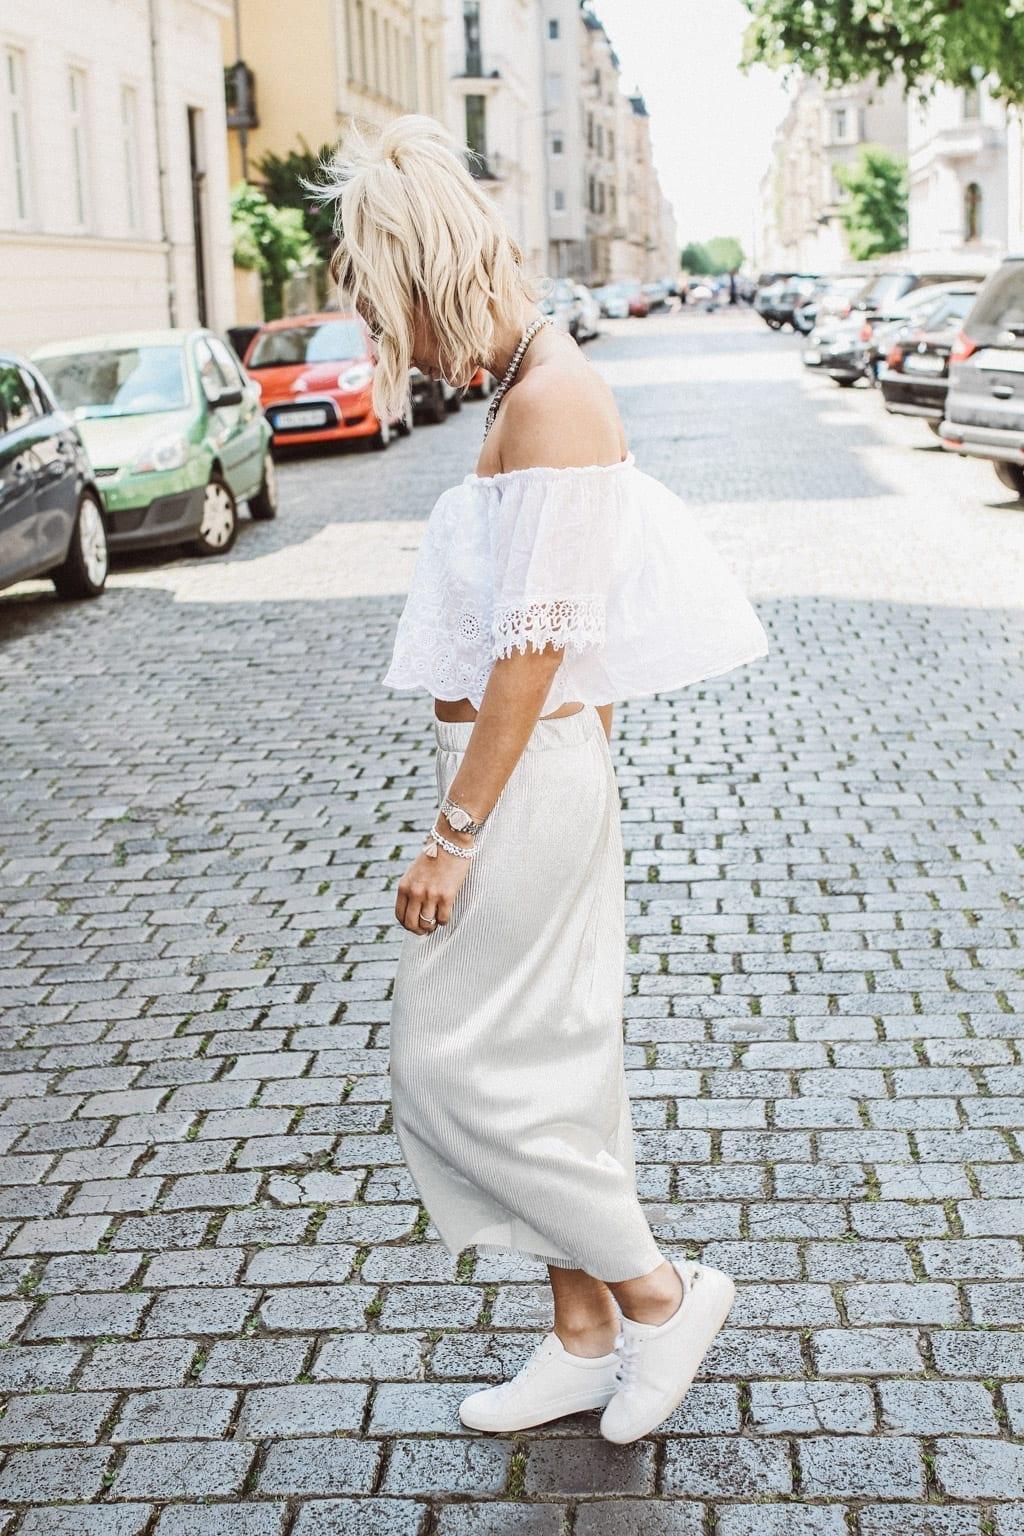 CK160511_Constantly-K-Karin-Kaswurm-Model-Spring-Street-Style-Fashion-Summer-Culotter-Silver-6984